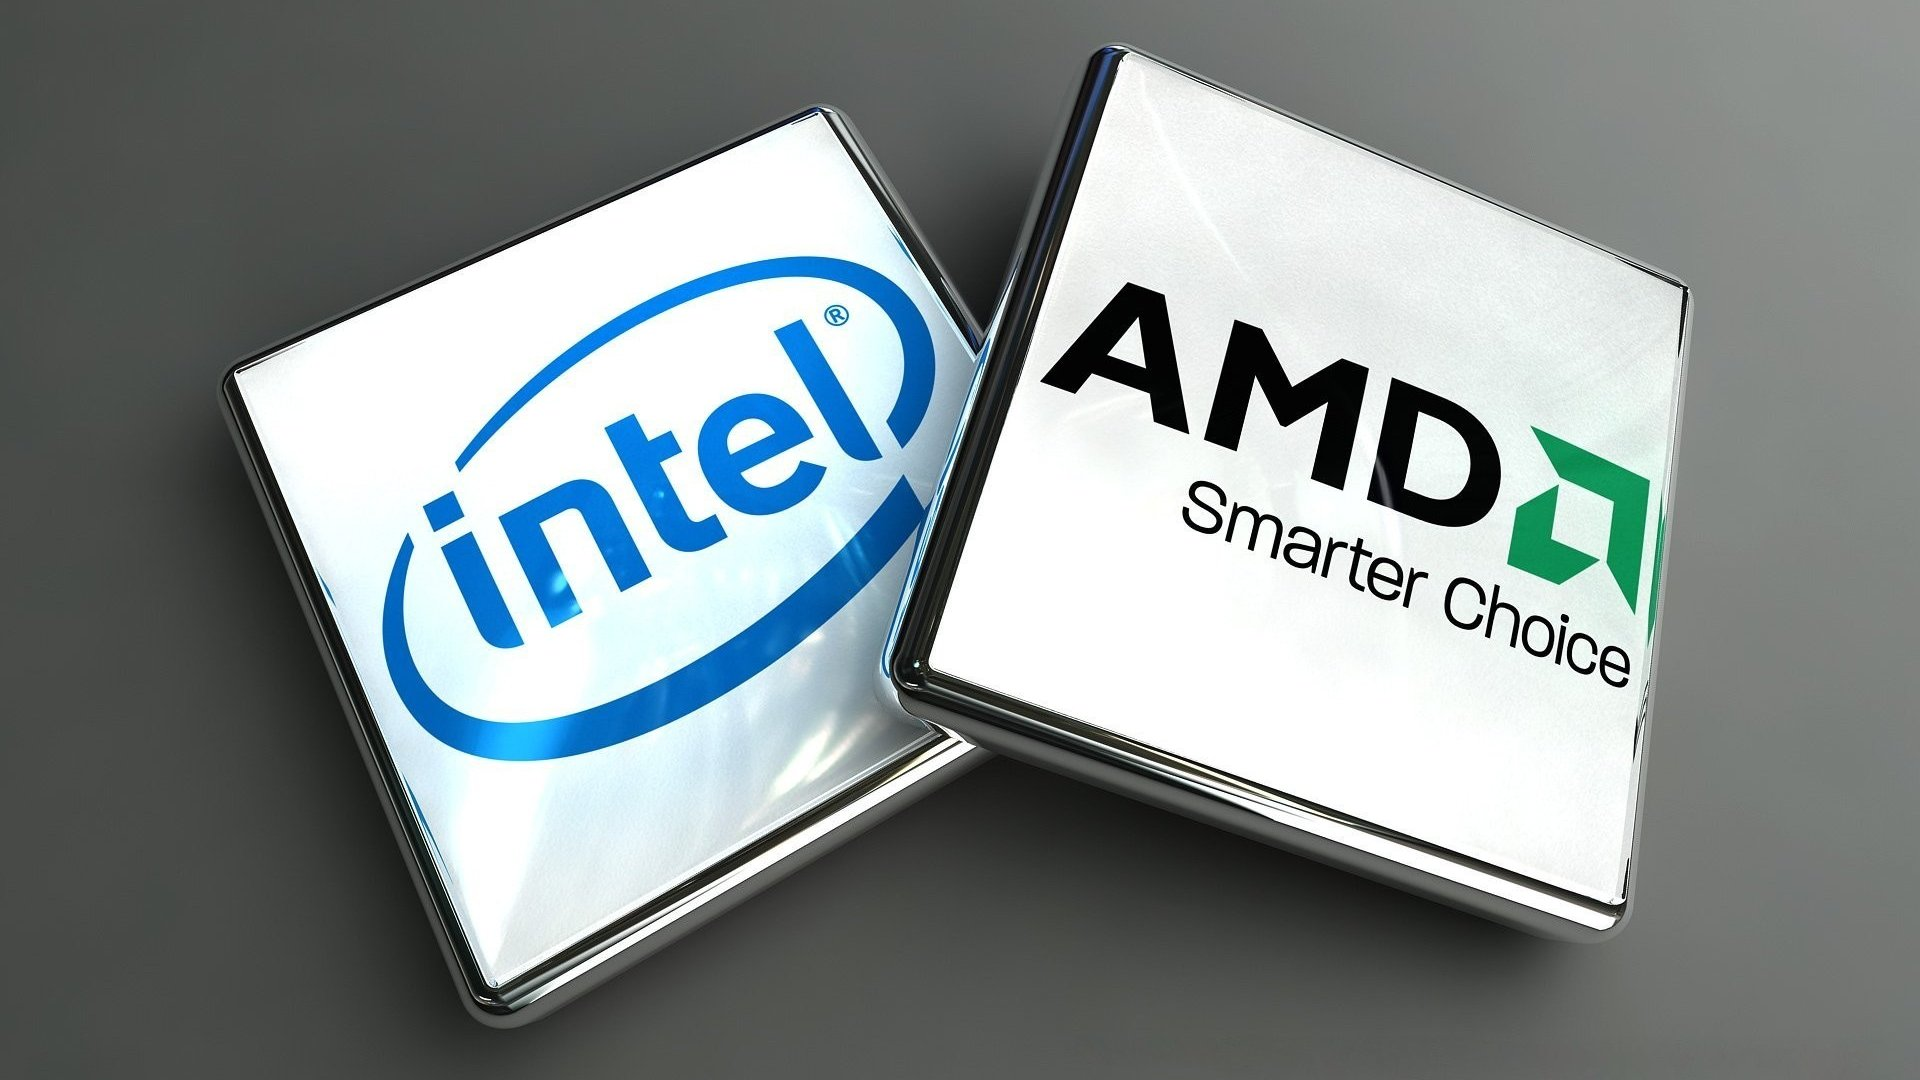 amd-intel-smarter-choice